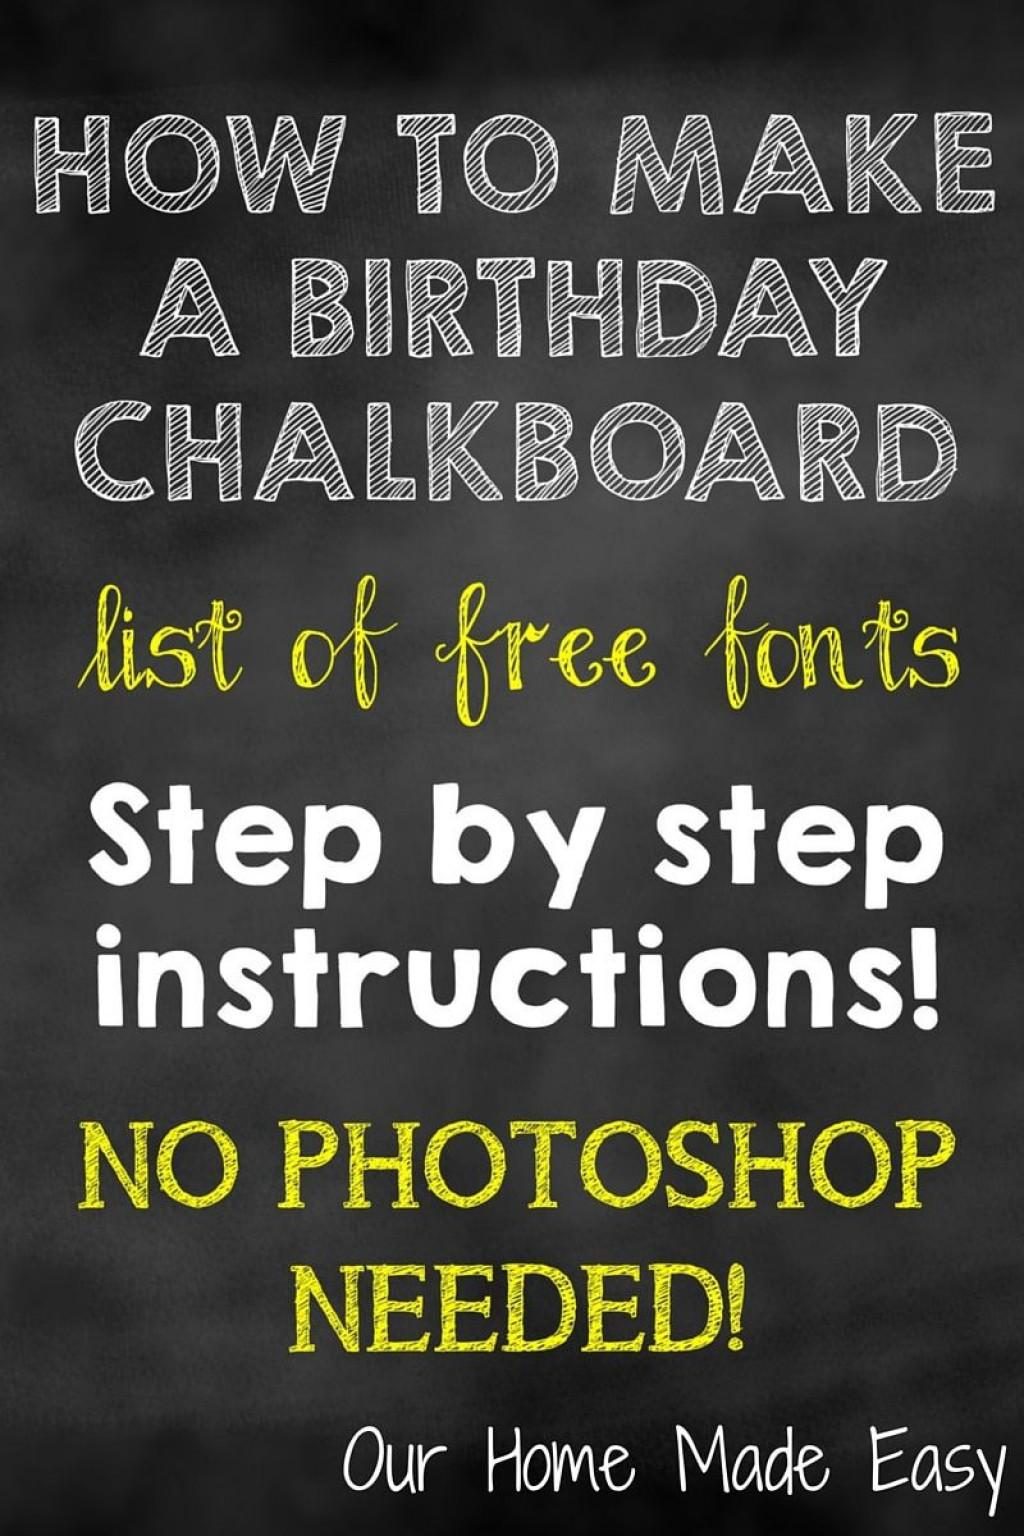 004 Top First Birthday Chalkboard Template High Resolution  Diy Printable FreeLarge